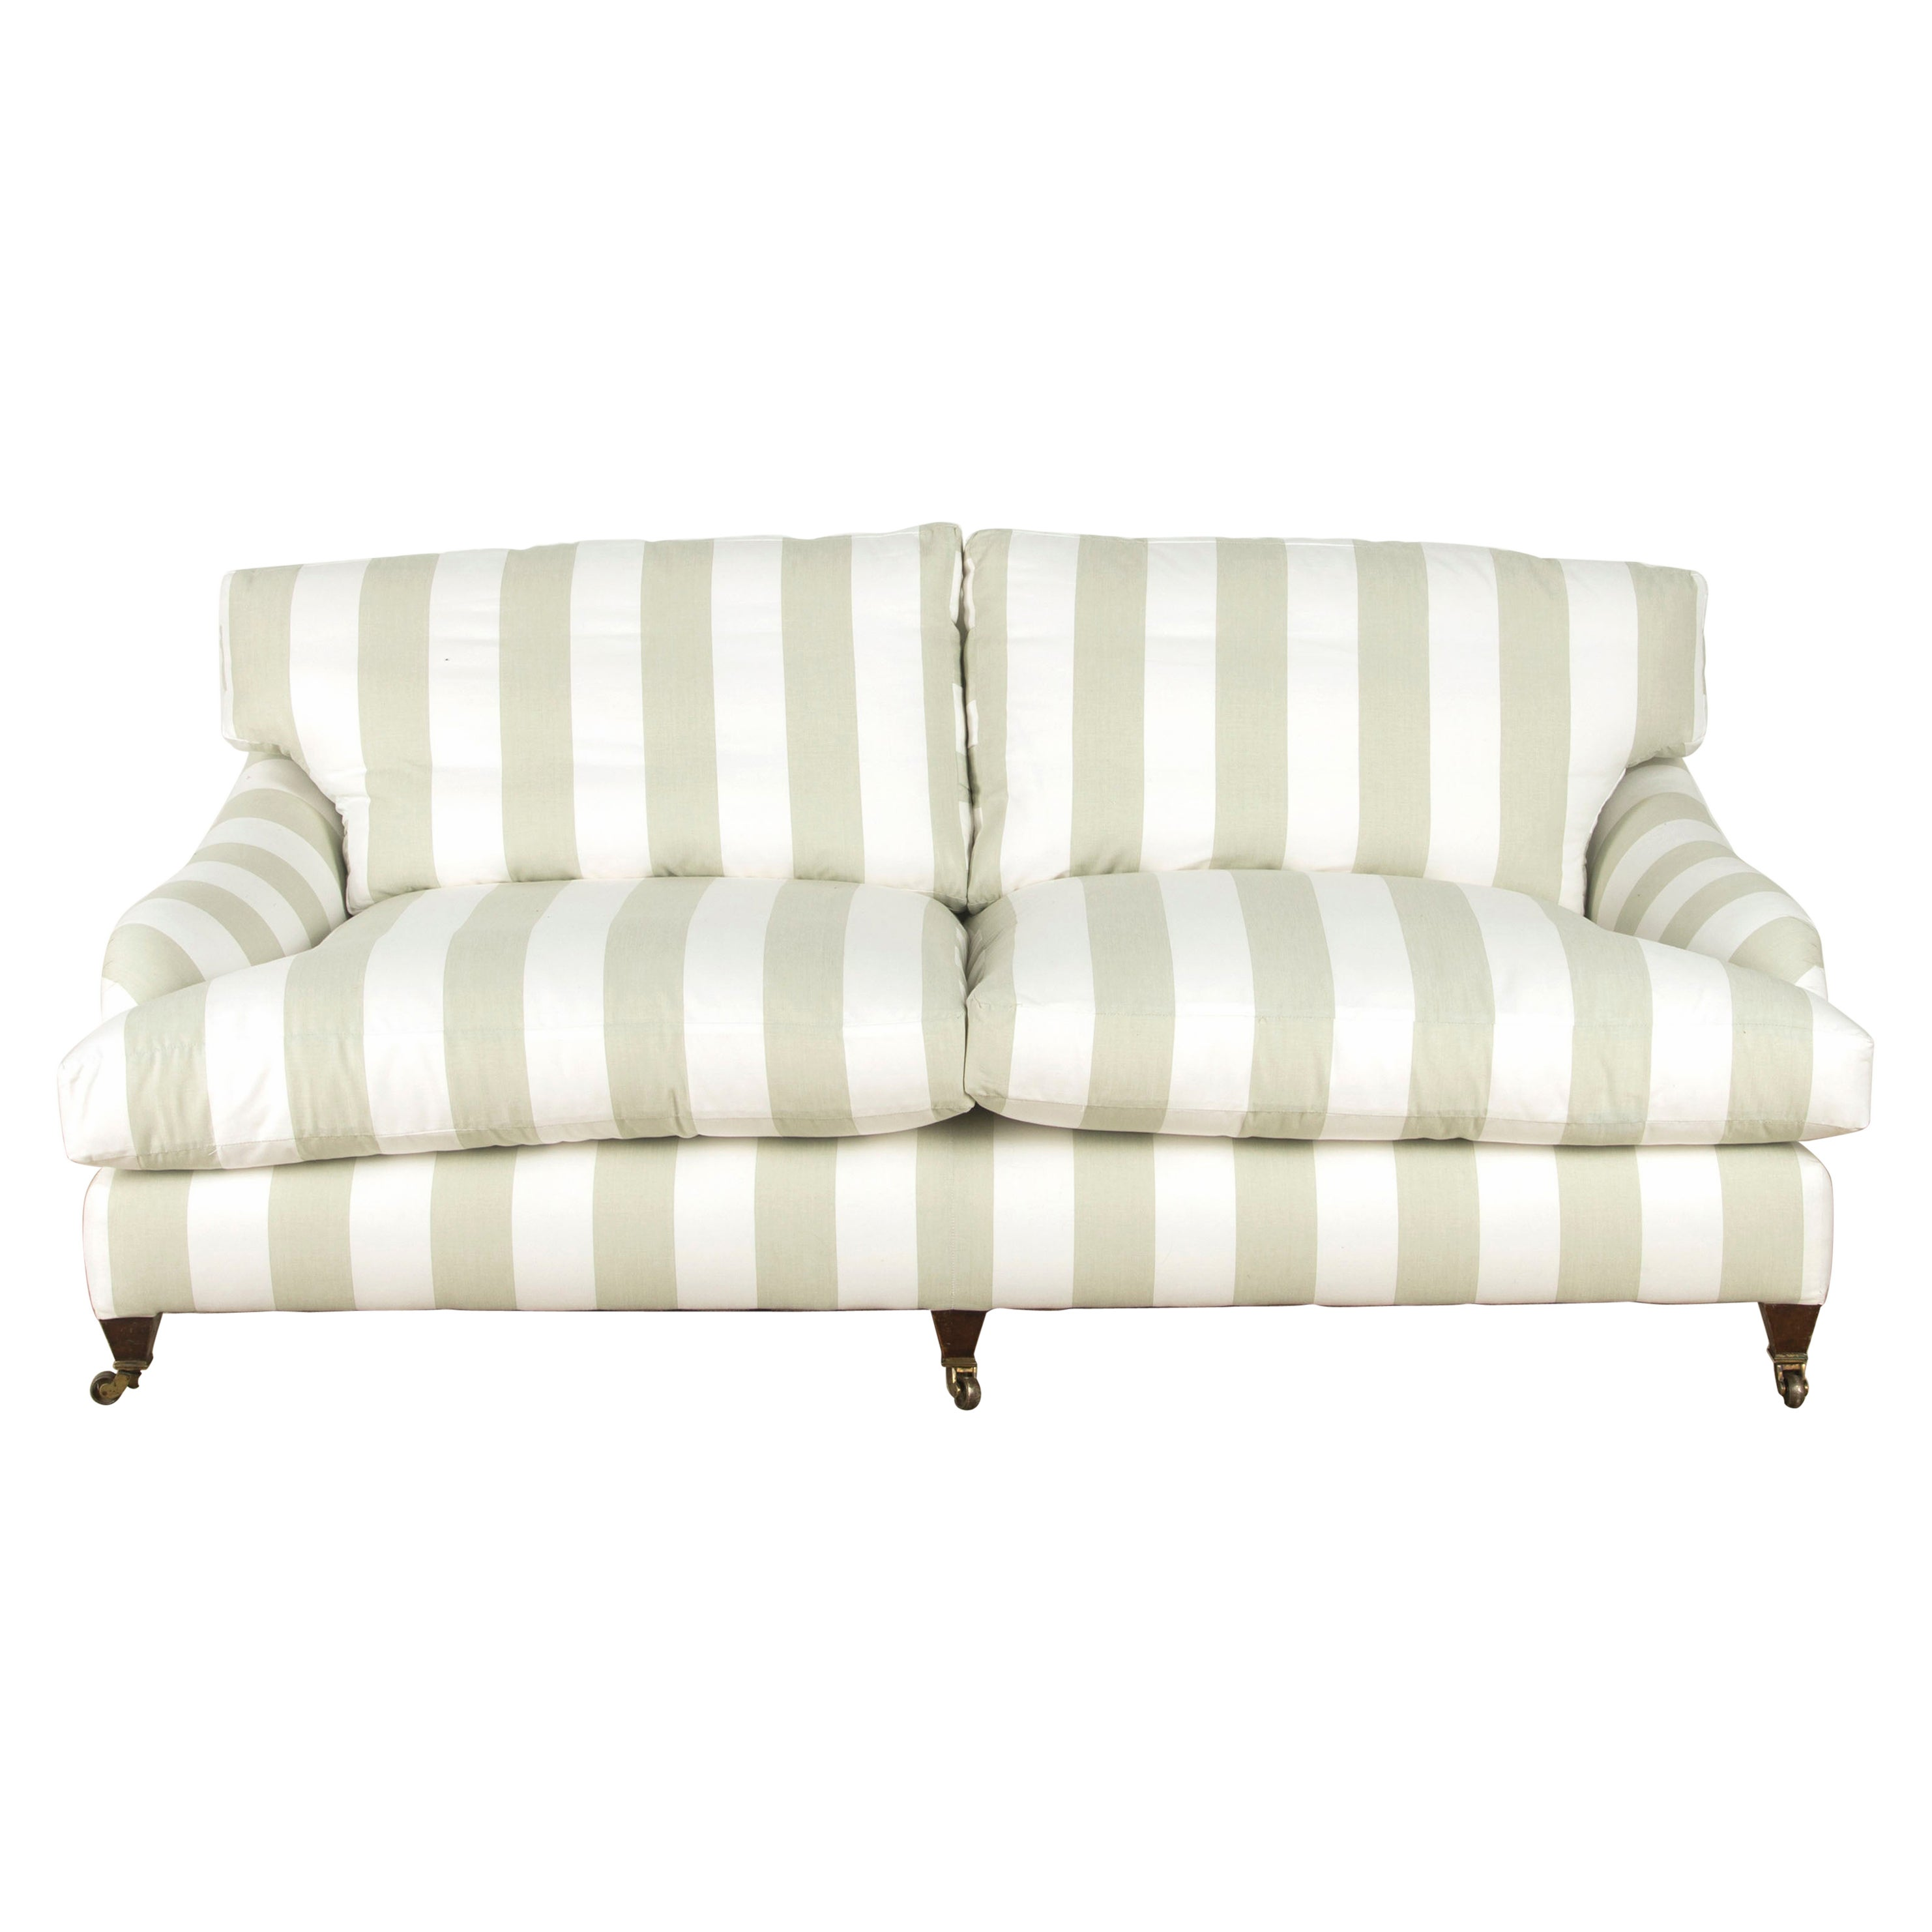 Late 19th Century English Howard Style Sofa